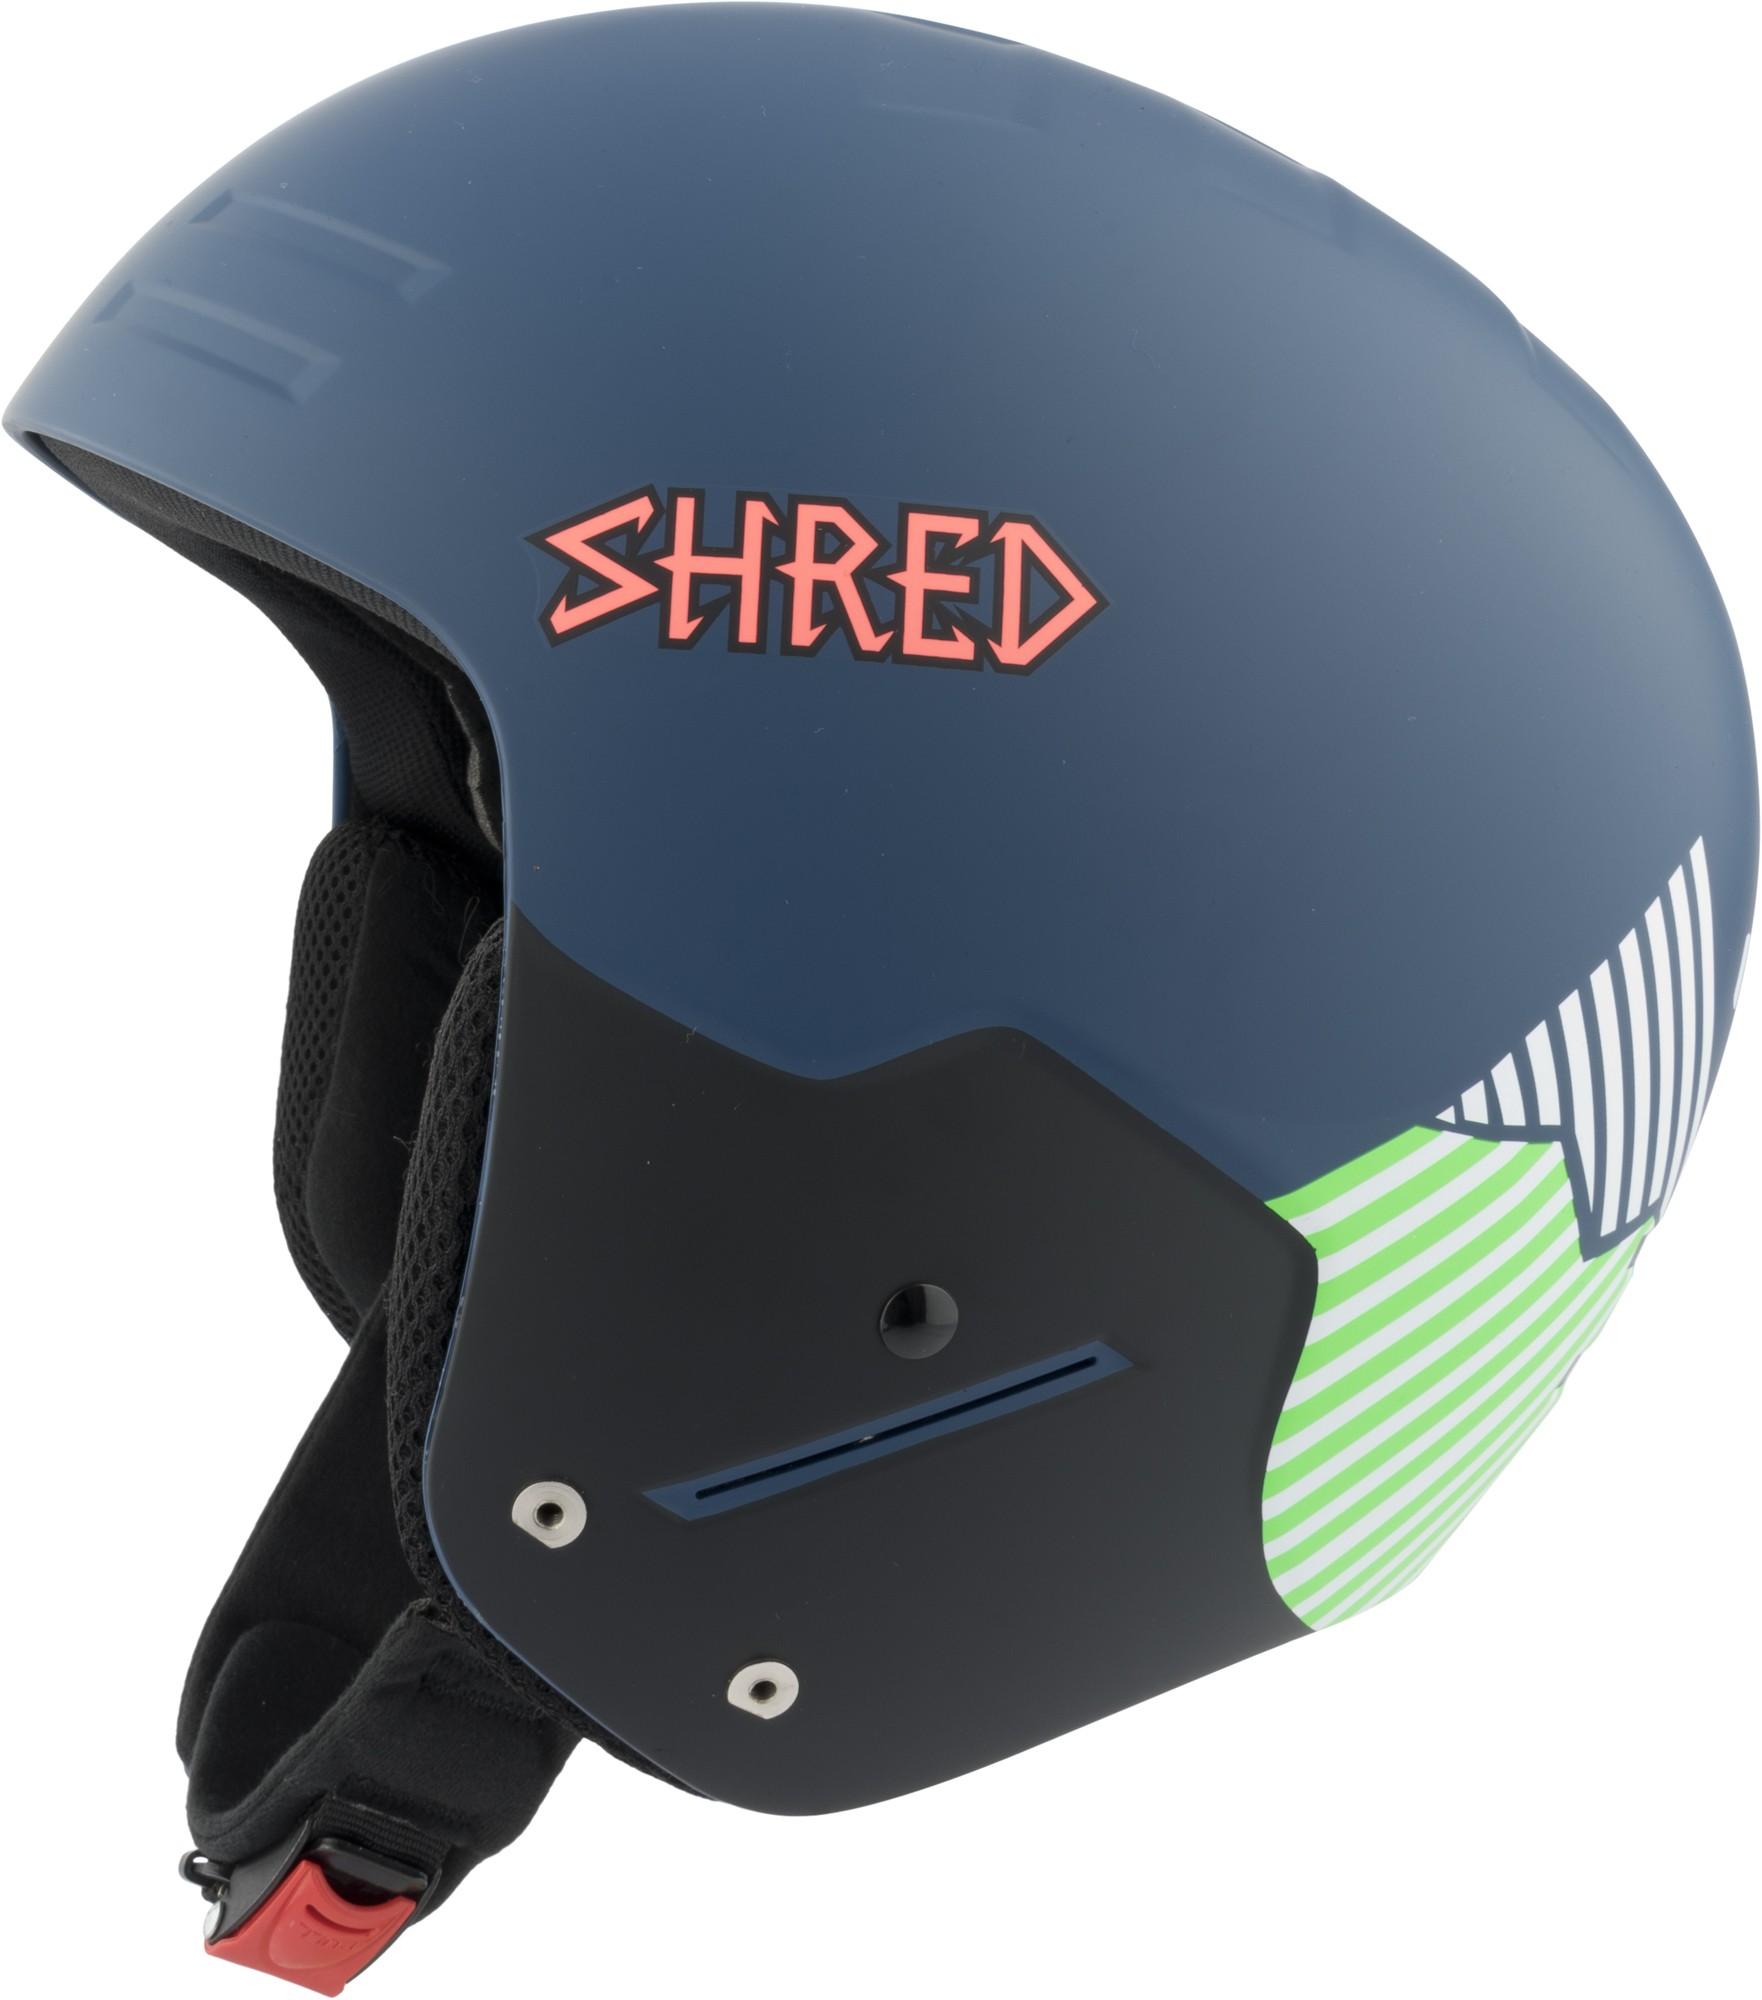 Shred FIS BASHER NoShock NeedMoreSnow helmet, 2017